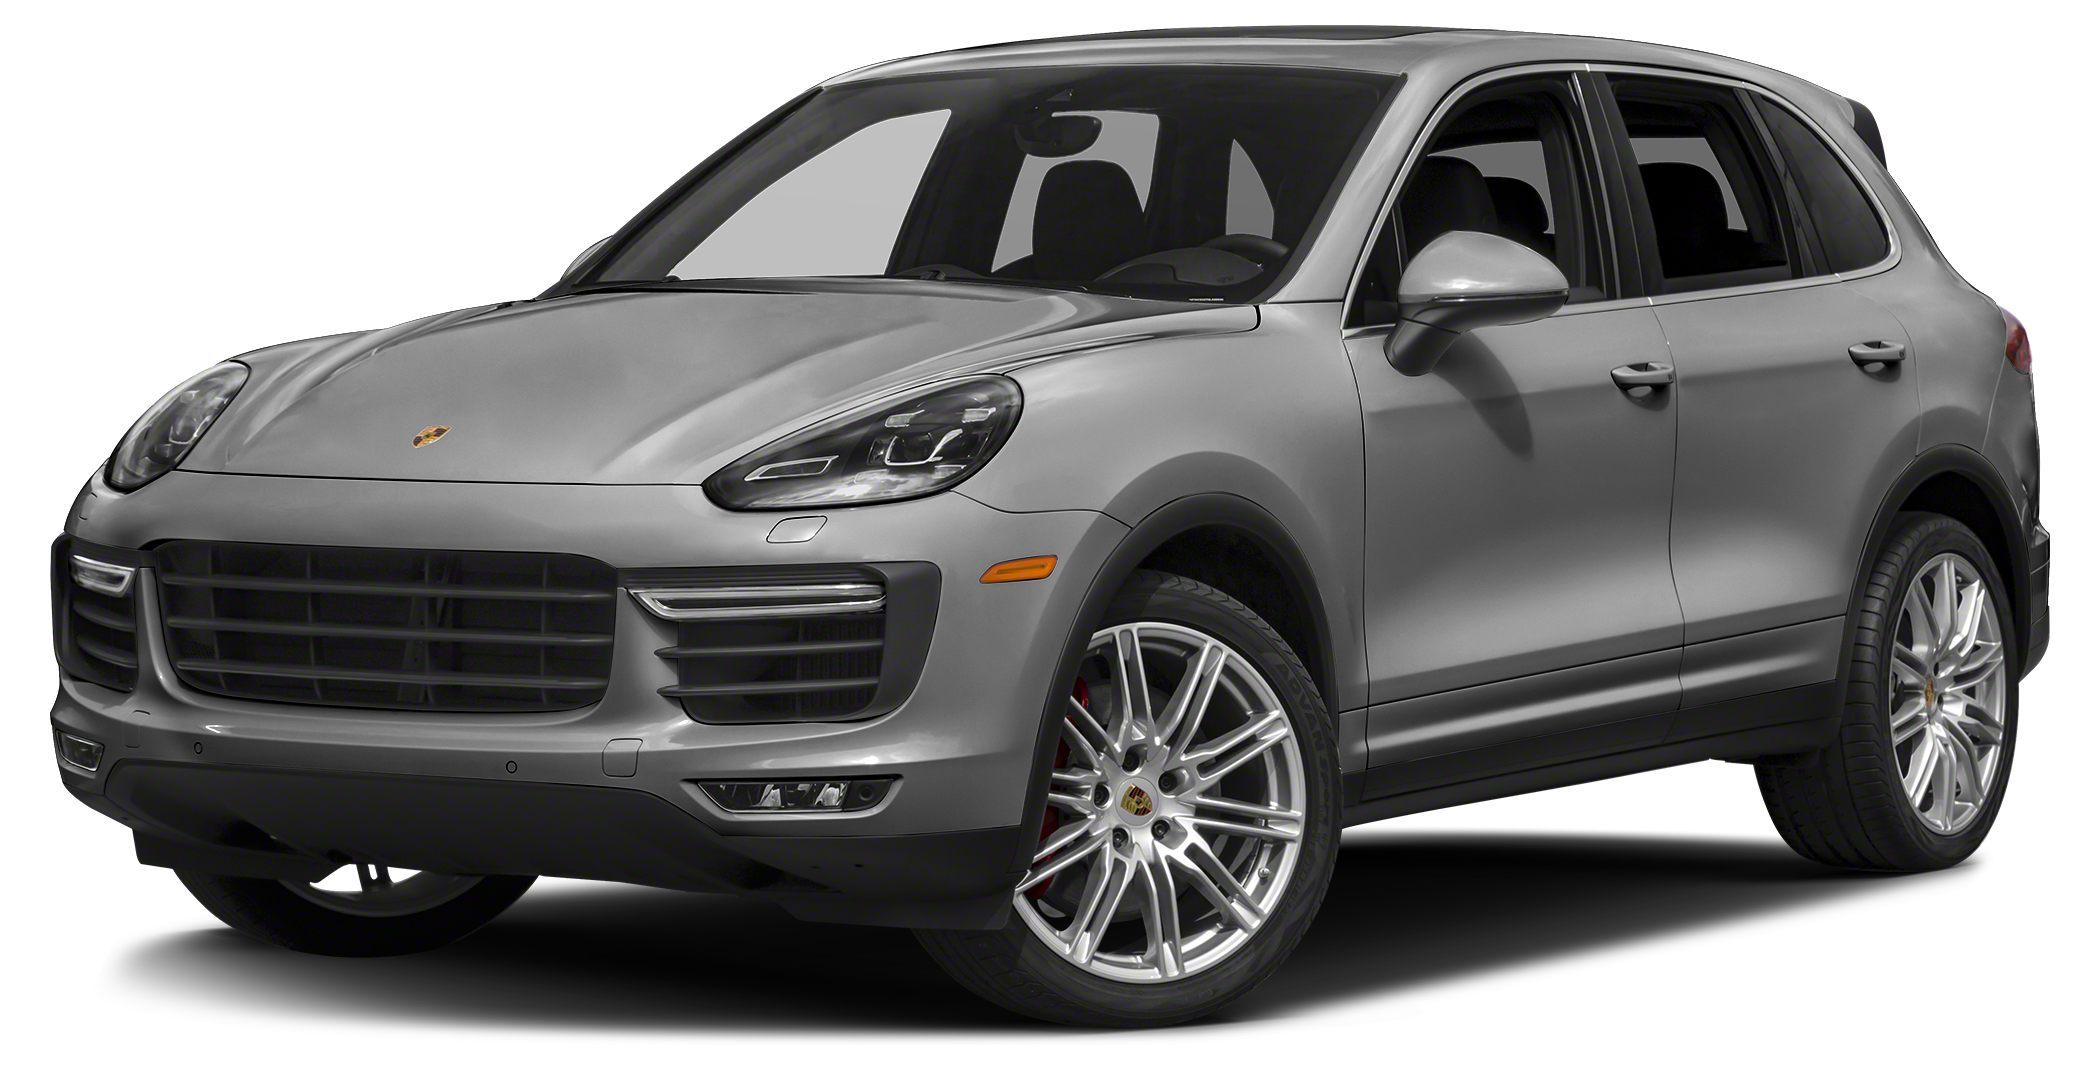 2018 Porsche Cayenne Turbo Color Meteorite Stock P1673 VIN WP1AC2A25JLA85147